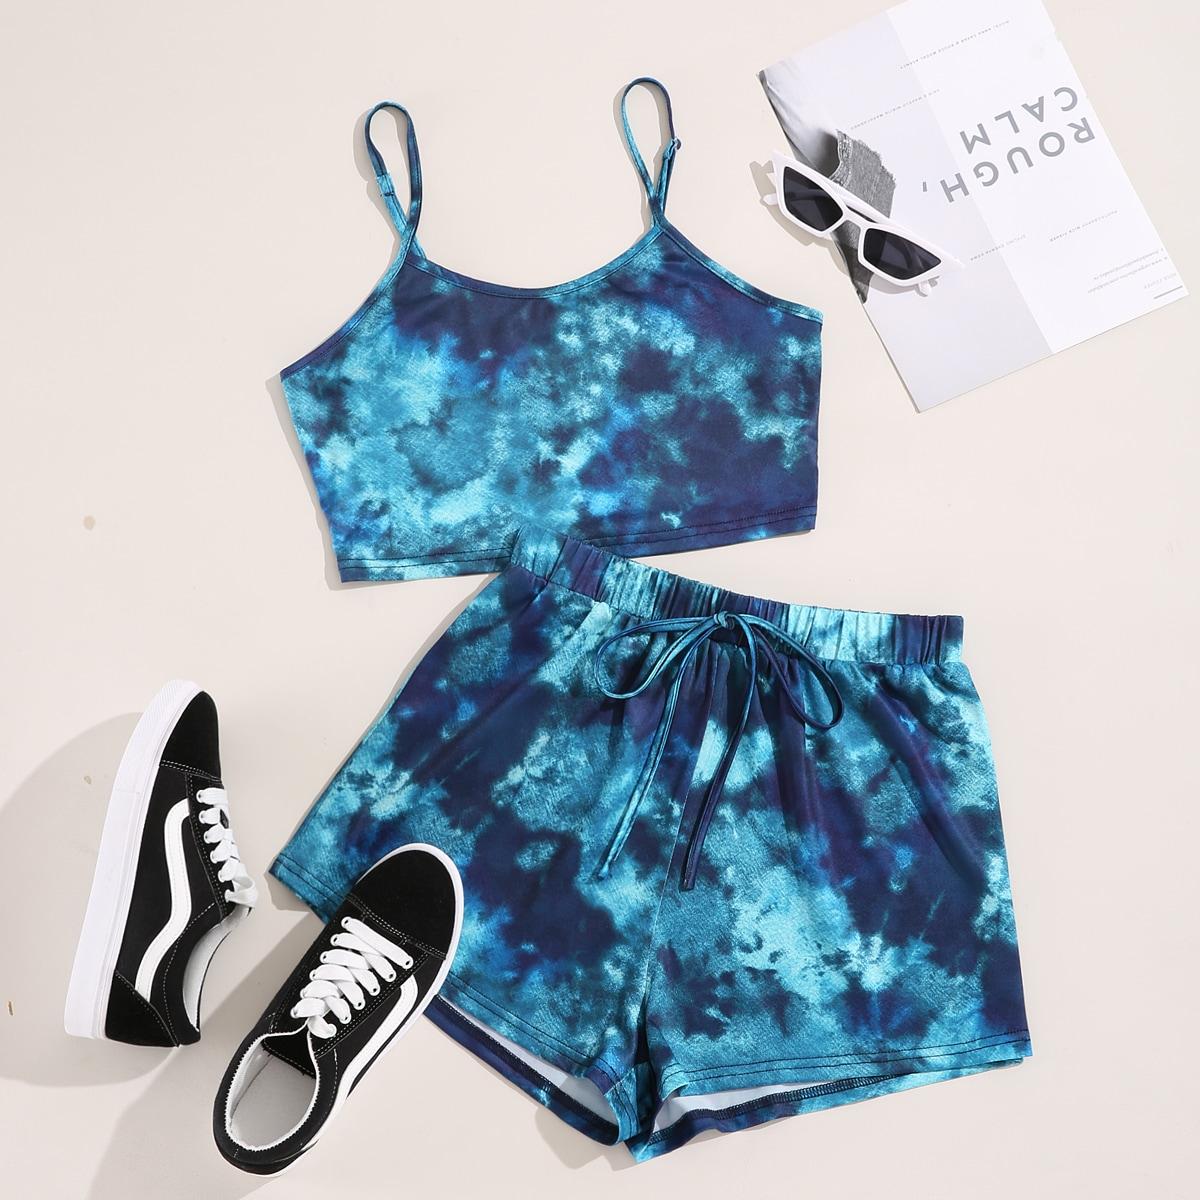 SHEIN / Tie Dye Cami Top & Knot Waist Track Shorts